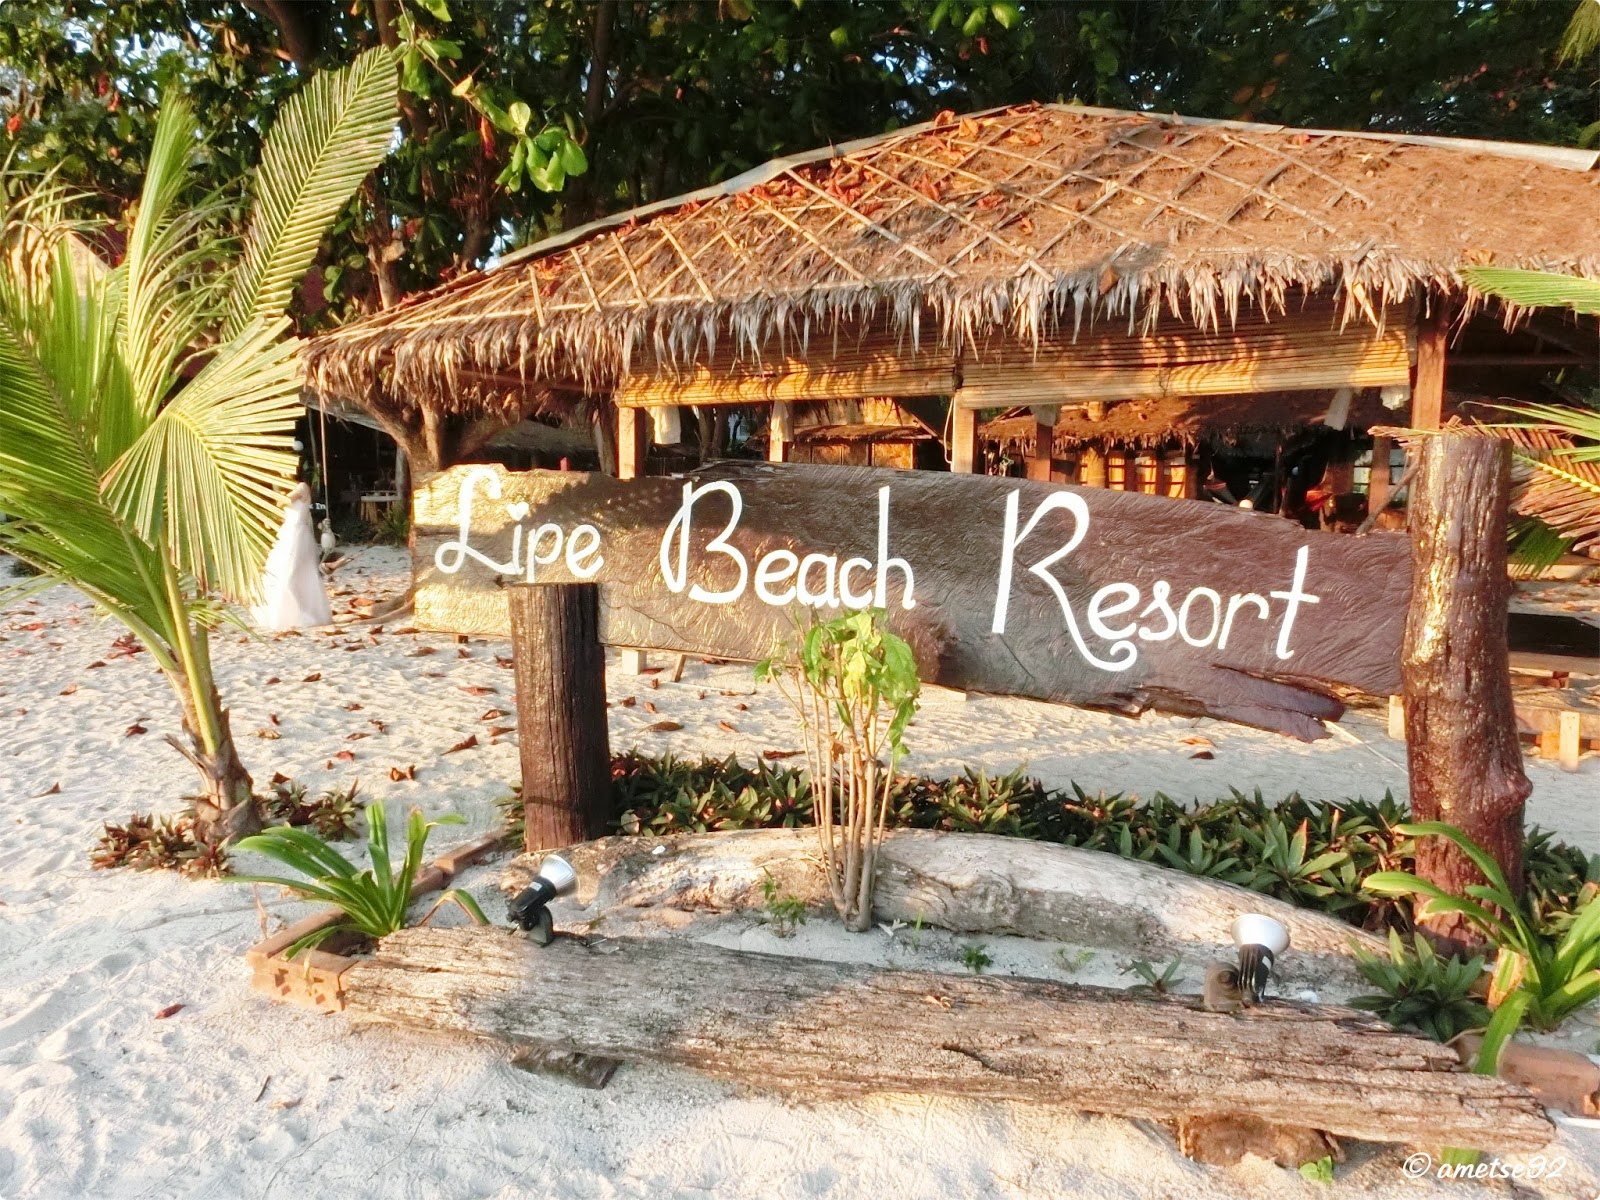 Bamboo garden rooms at lipe beach resort koh lipe - Bamboo Garden Rooms At Lipe Beach Resort Koh Lipe 31